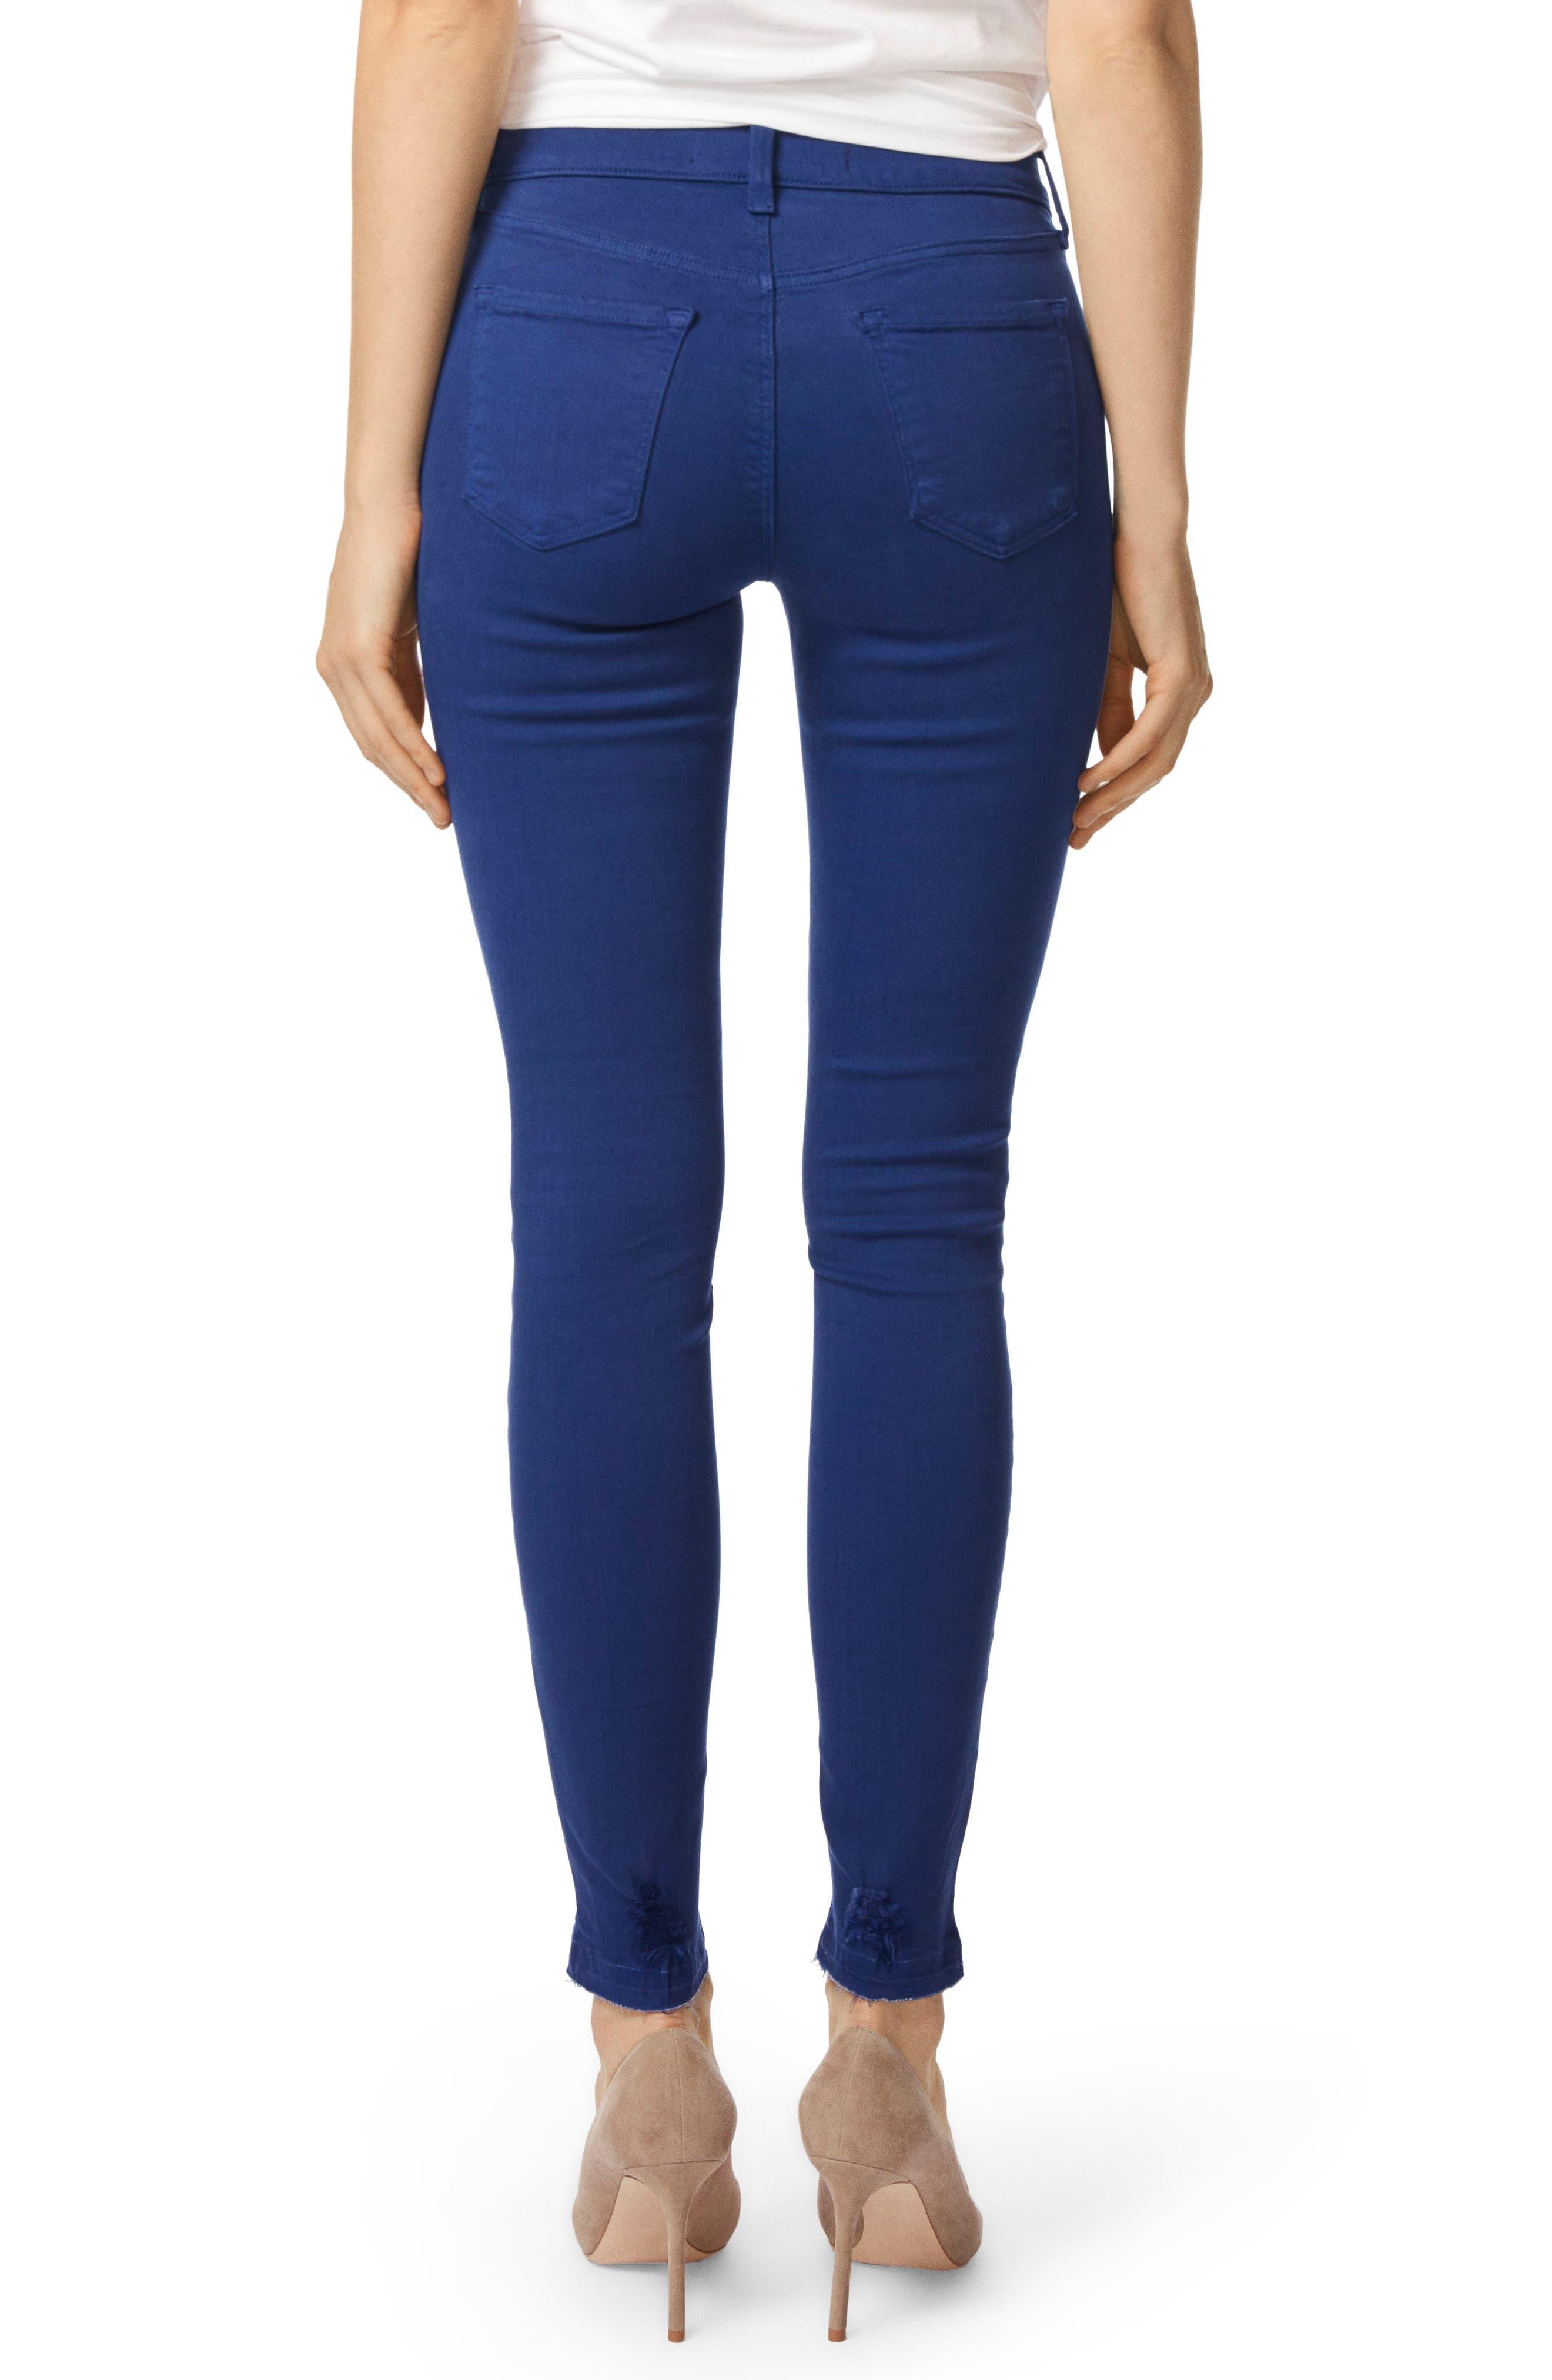 620 Mid Rise Super Skinny Jeans,                             Alternate thumbnail 2, color,                             436